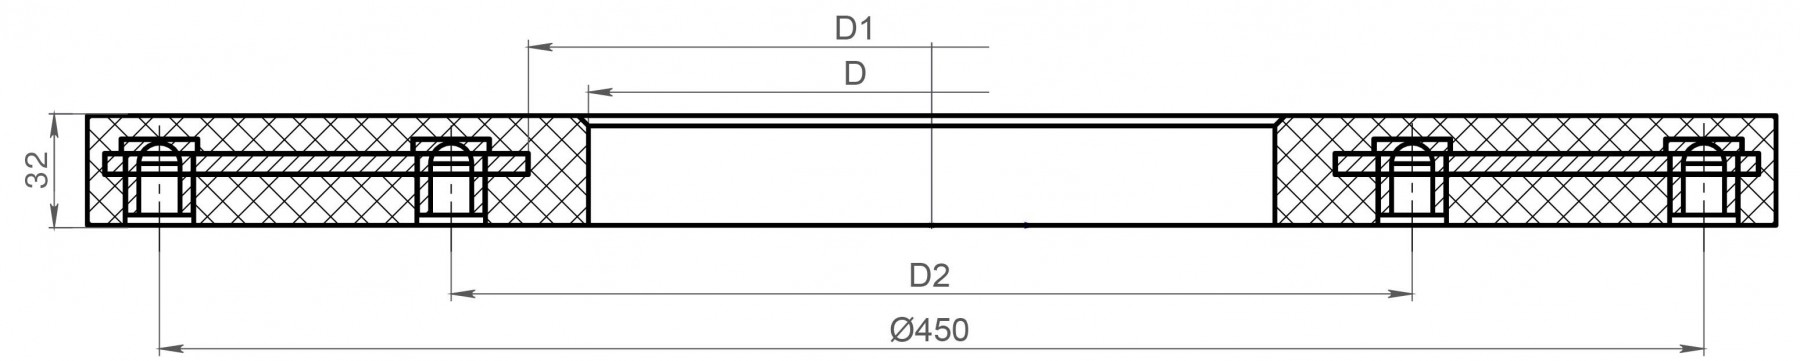 mm3484291867345